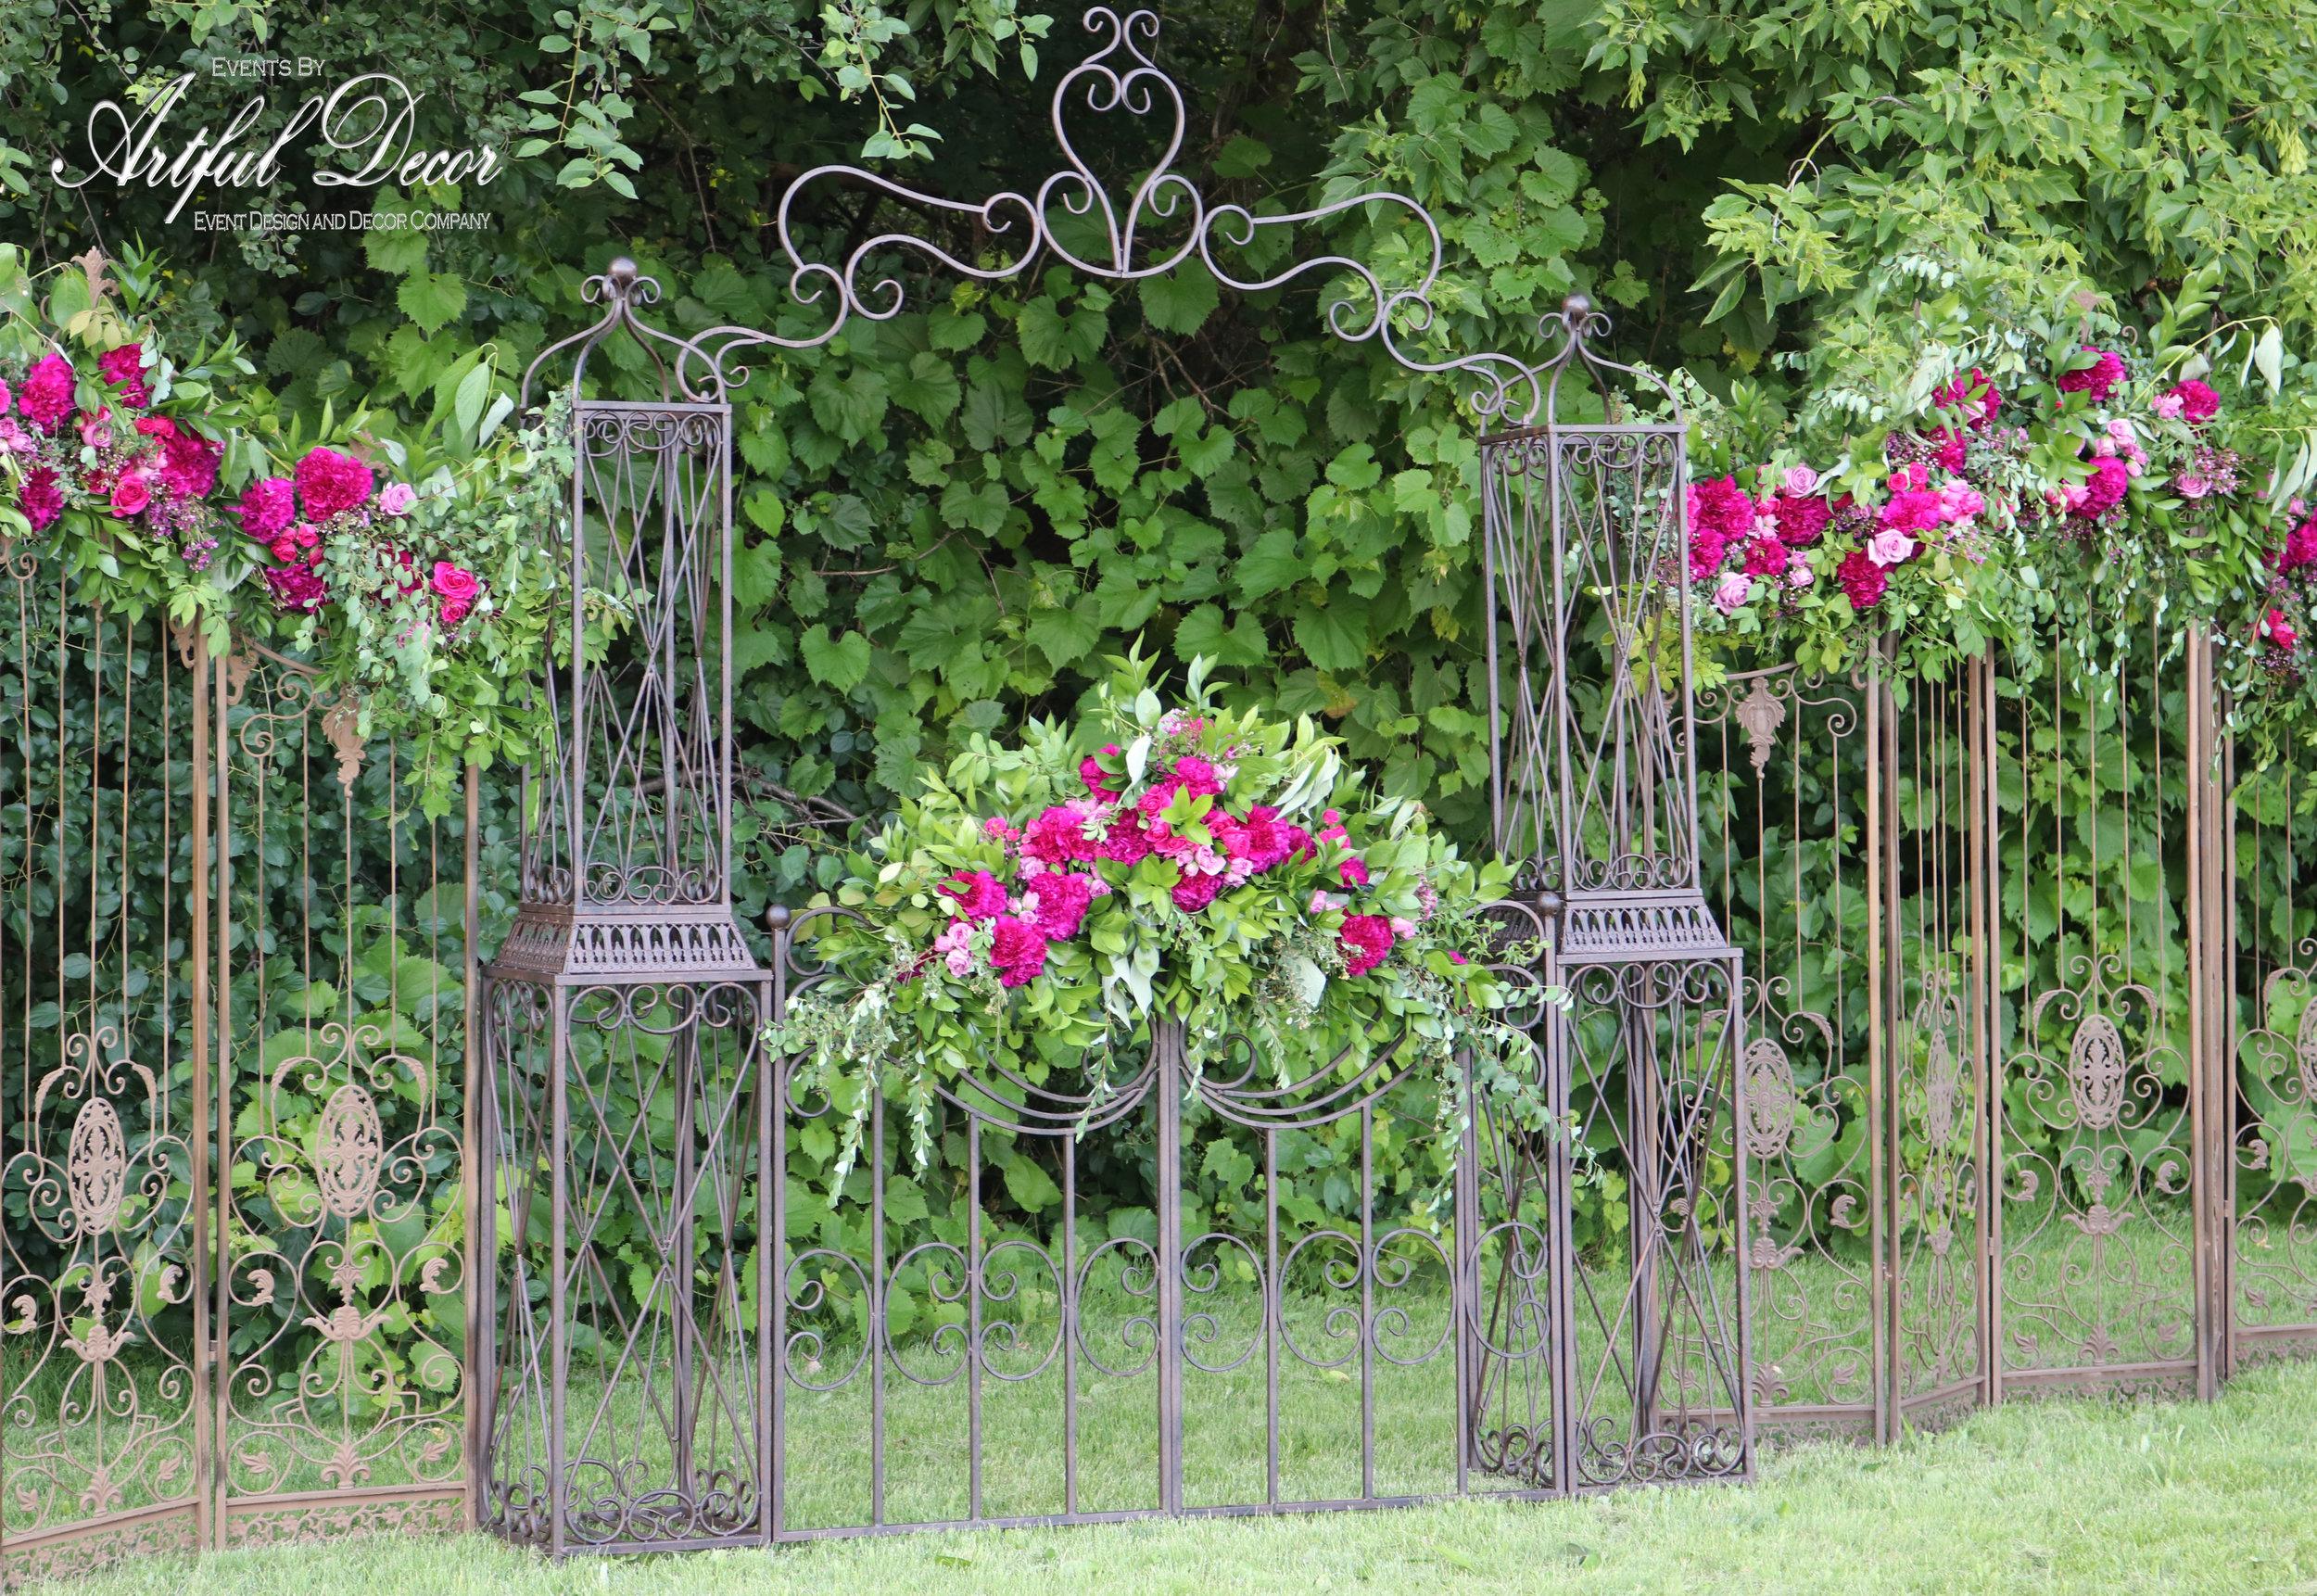 Garden Gate 54 Copyright.jpg